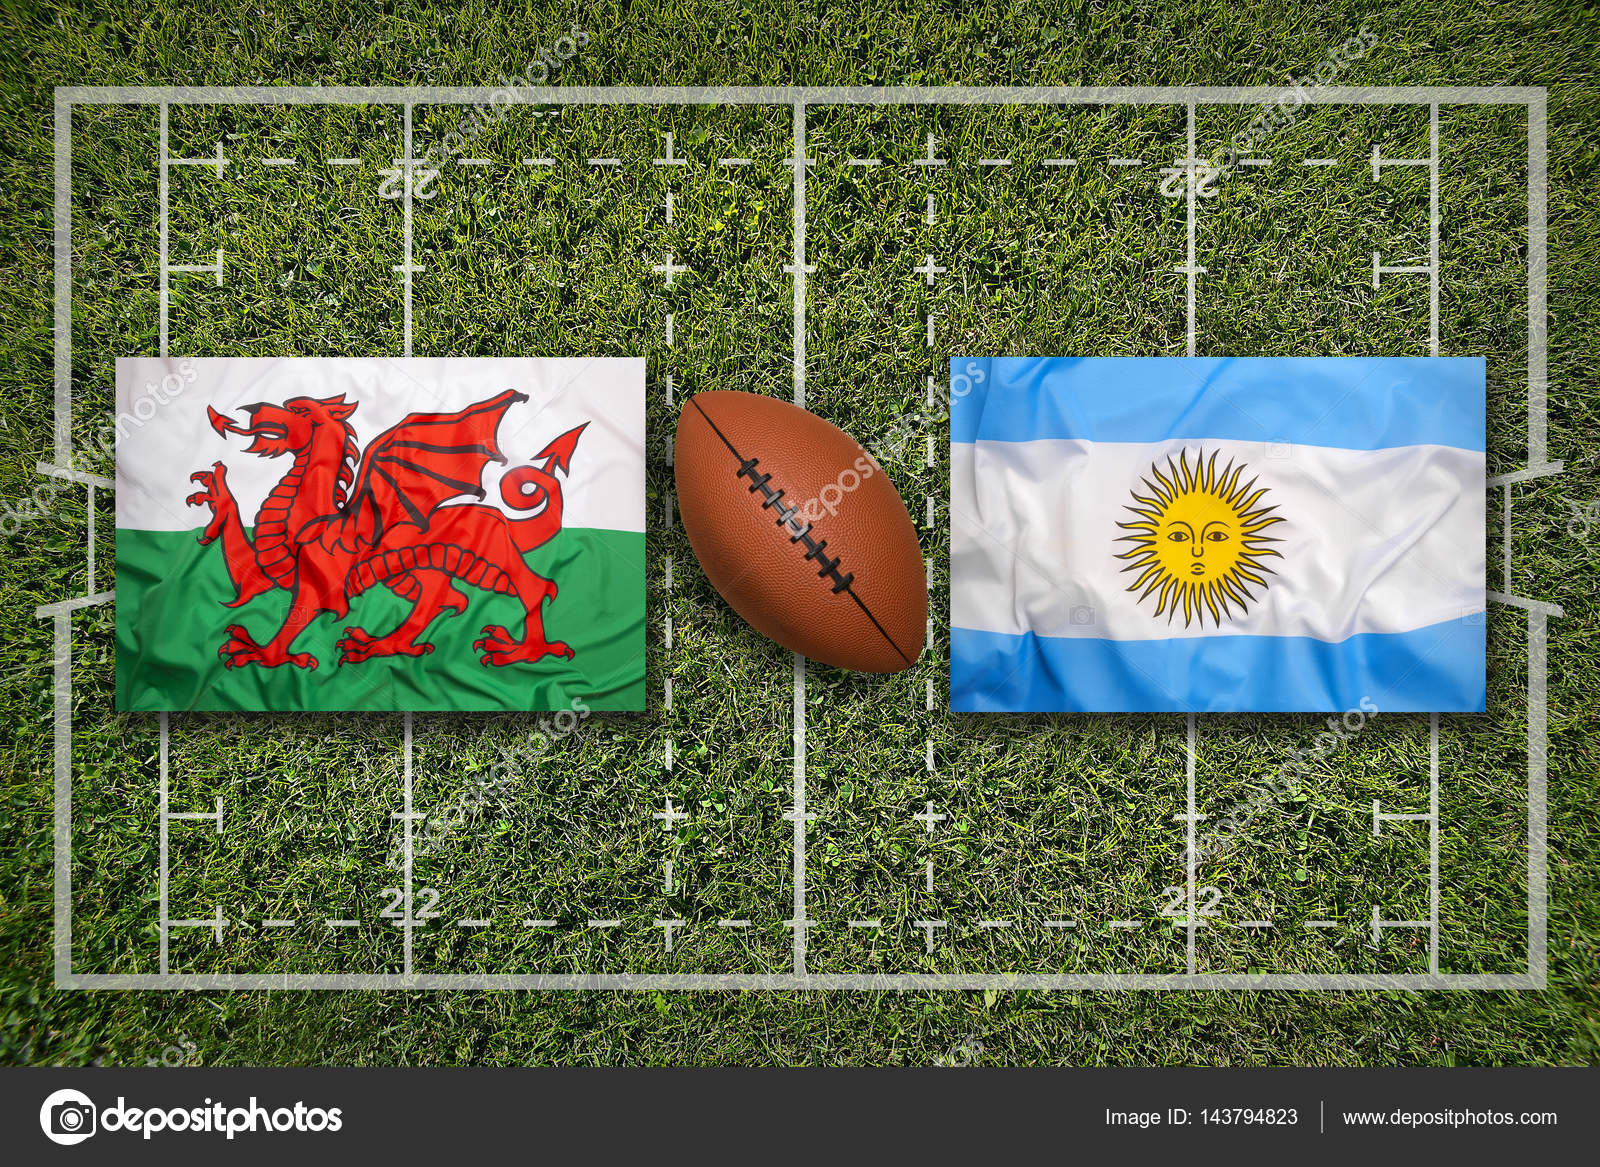 Image result for Argentina vs Wales